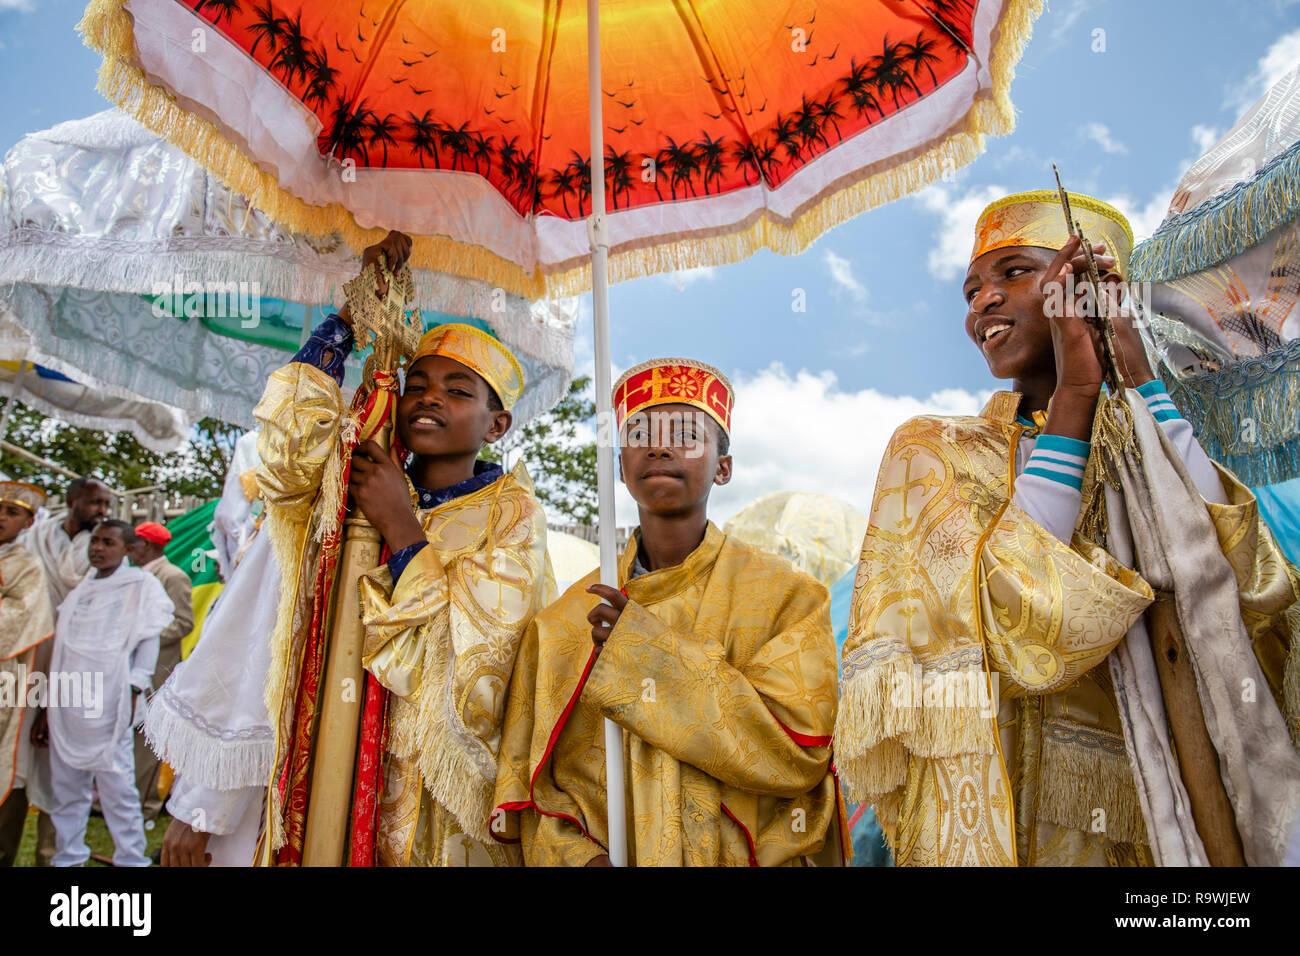 Meskel Festival of Arba Minch, Ethiopia Stock Photo